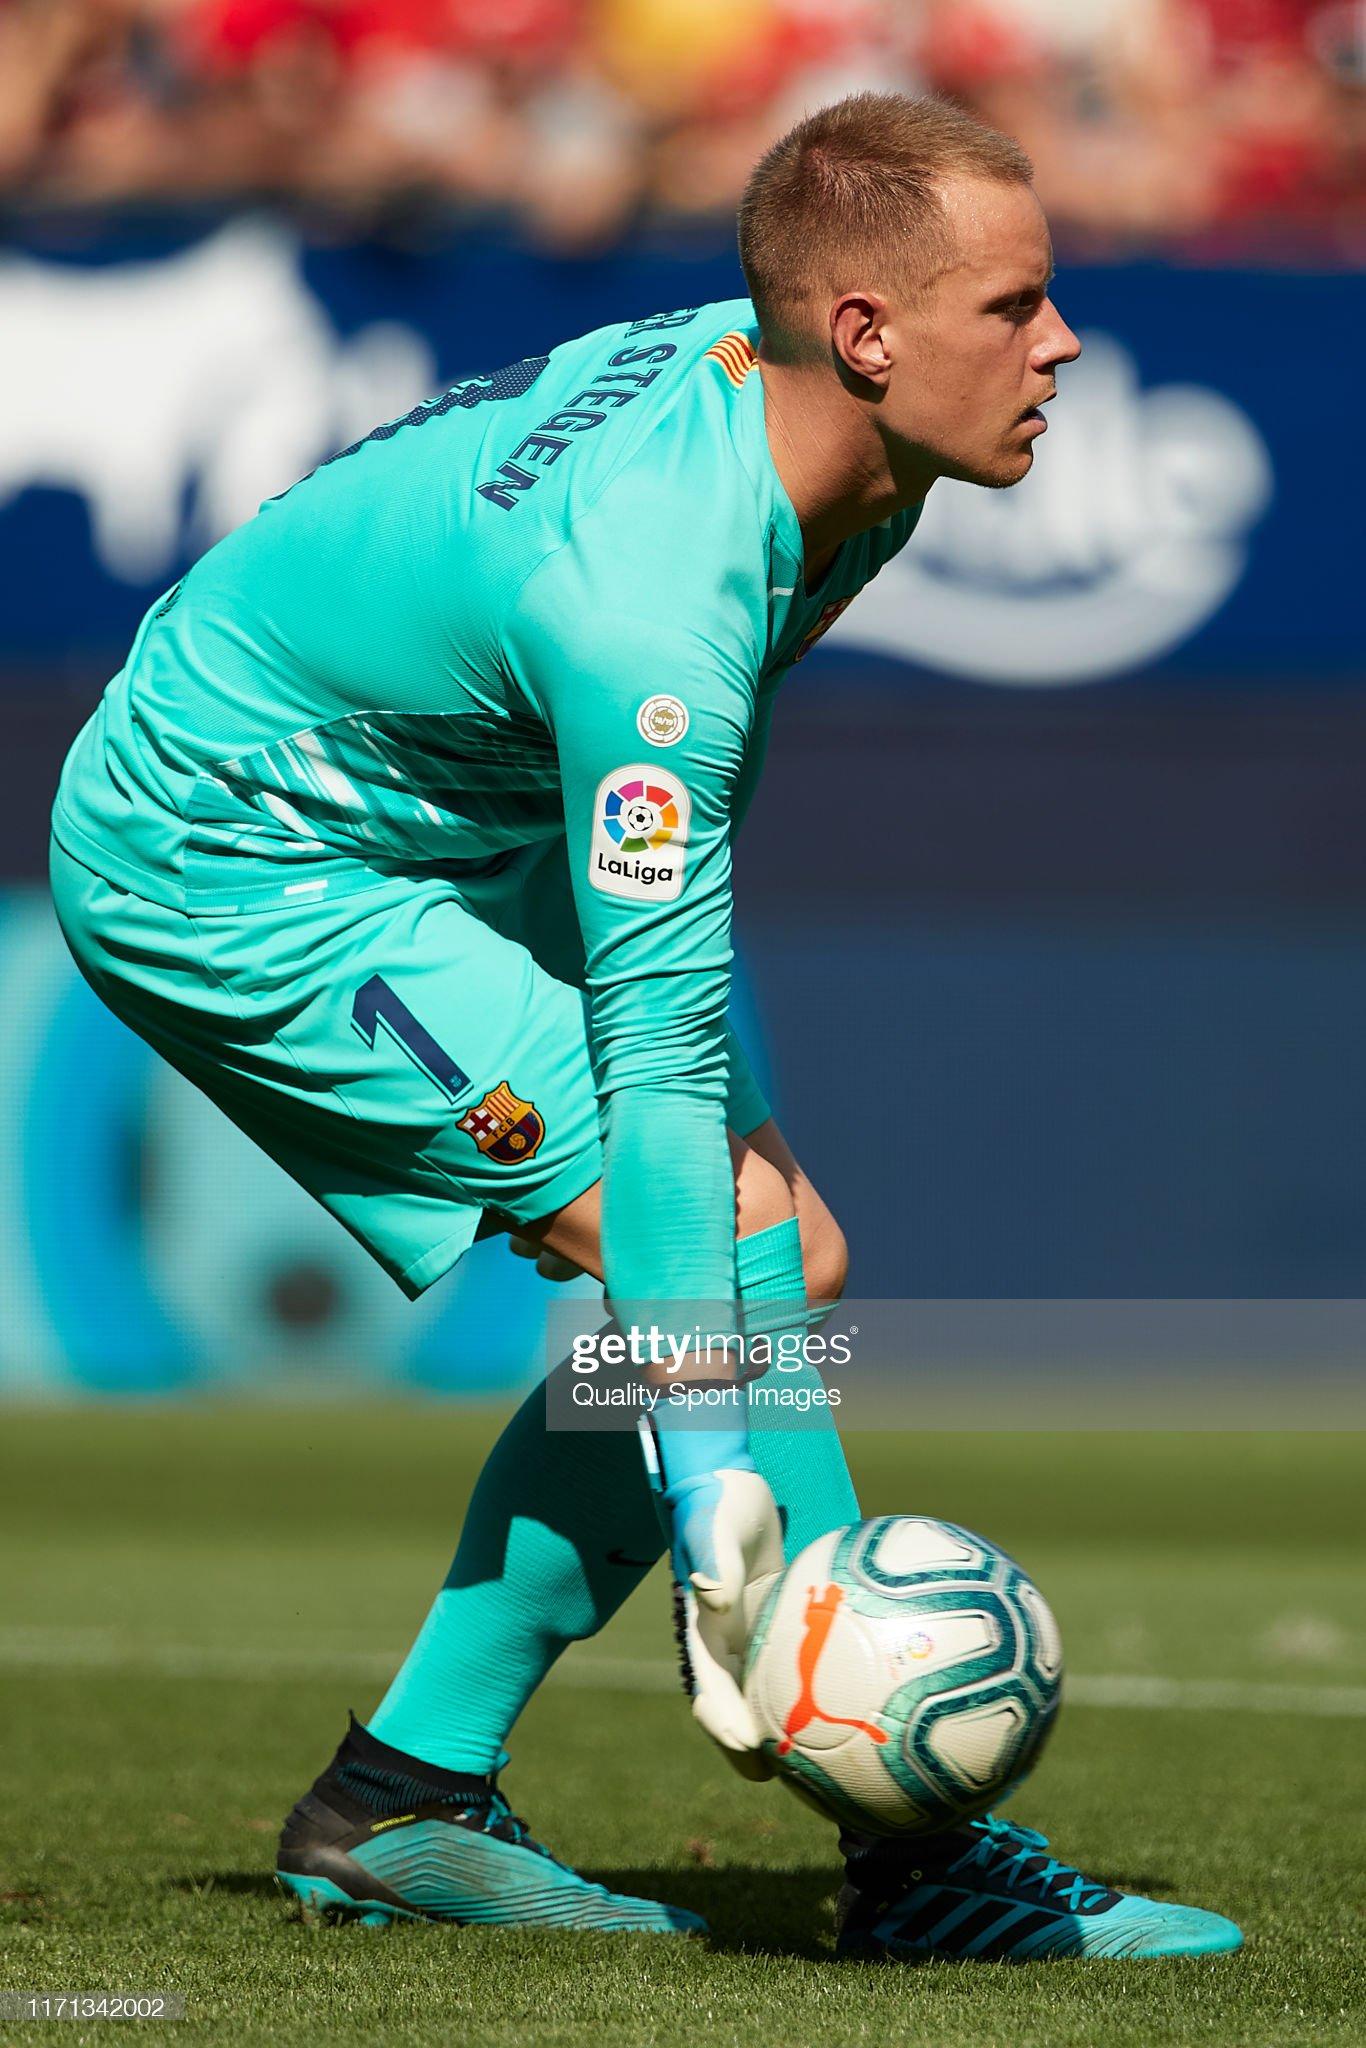 صور مباراة : أوساسونا - برشلونة 2-2 ( 31-08-2019 )  Marcandre-ter-stegen-of-fc-barcelona-in-action-during-the-liga-match-picture-id1171342002?s=2048x2048